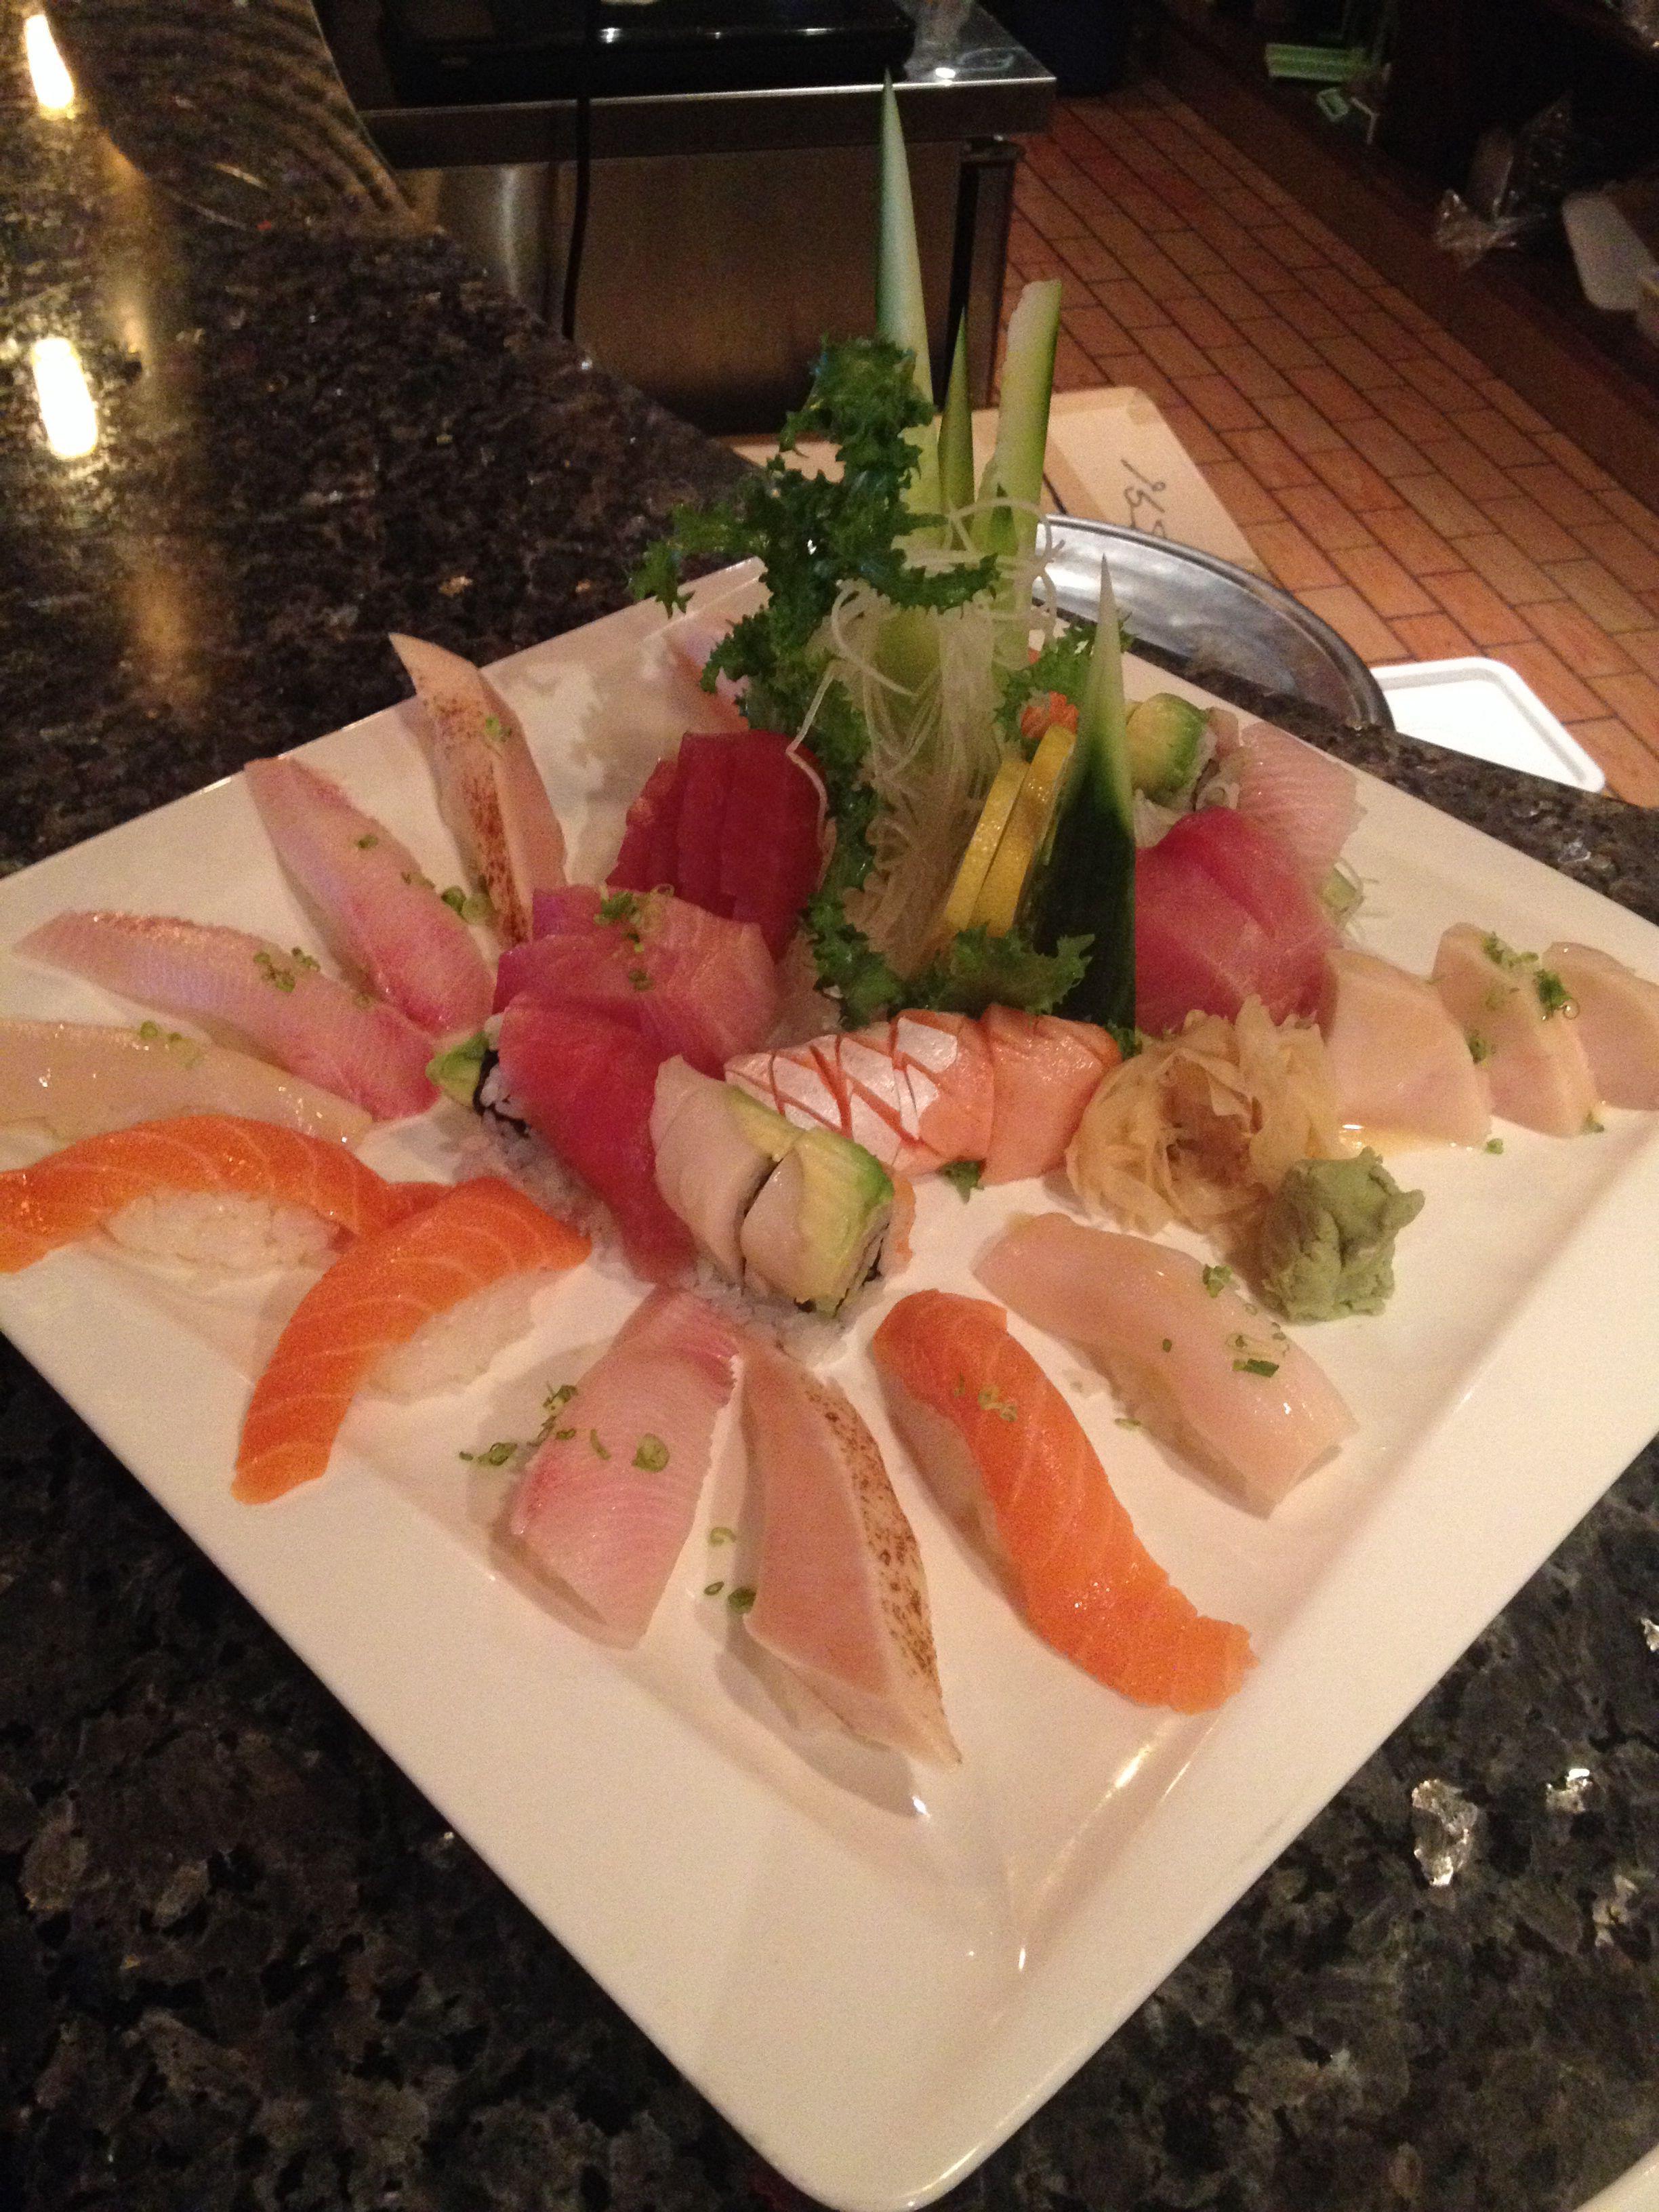 Sushi dinner anyone?